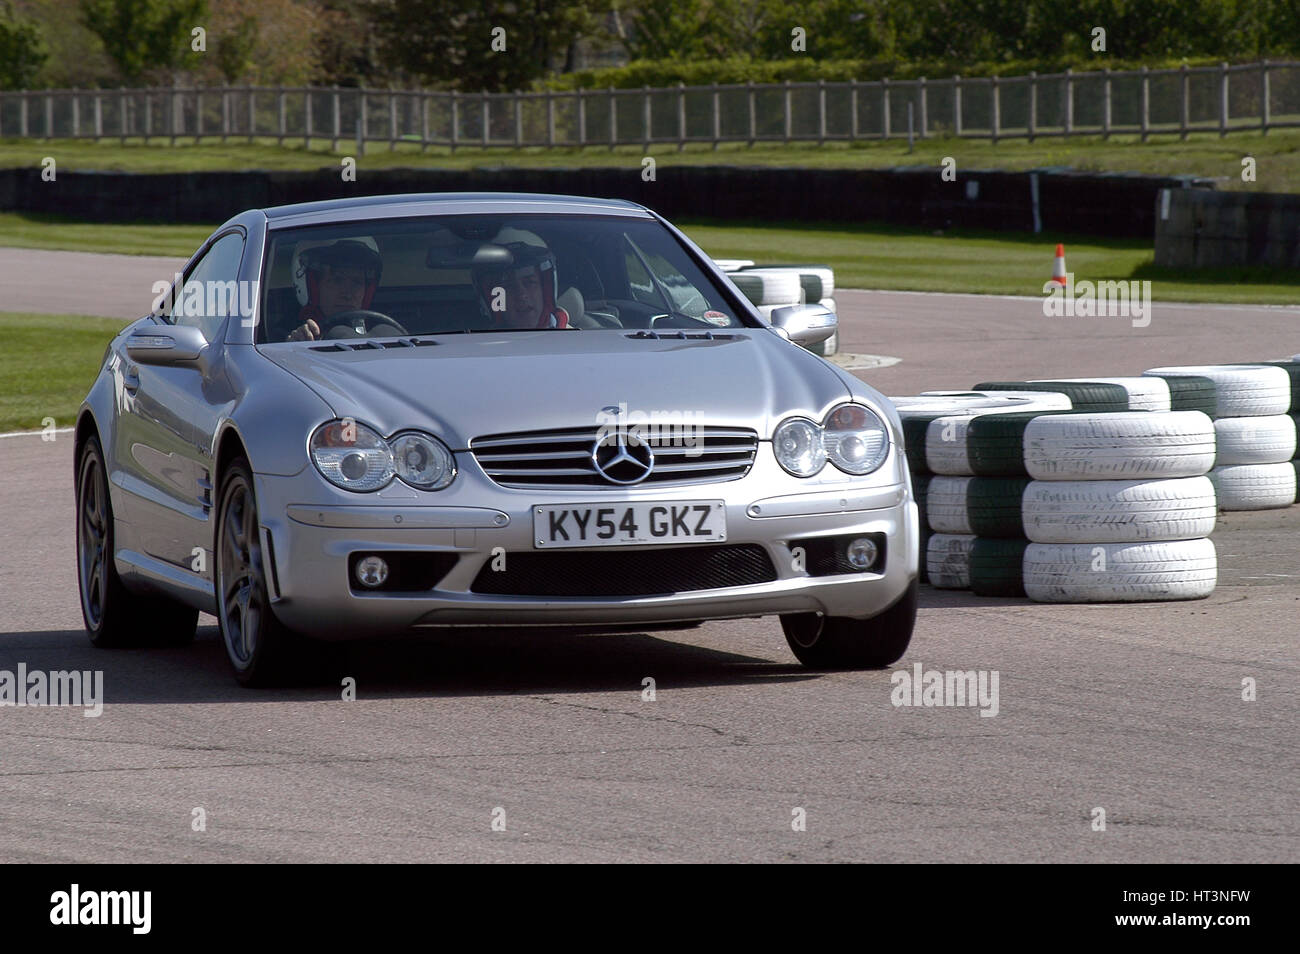 2004 Mercedes Benz 600 SLV12 Artist: Unknown. - Stock Image